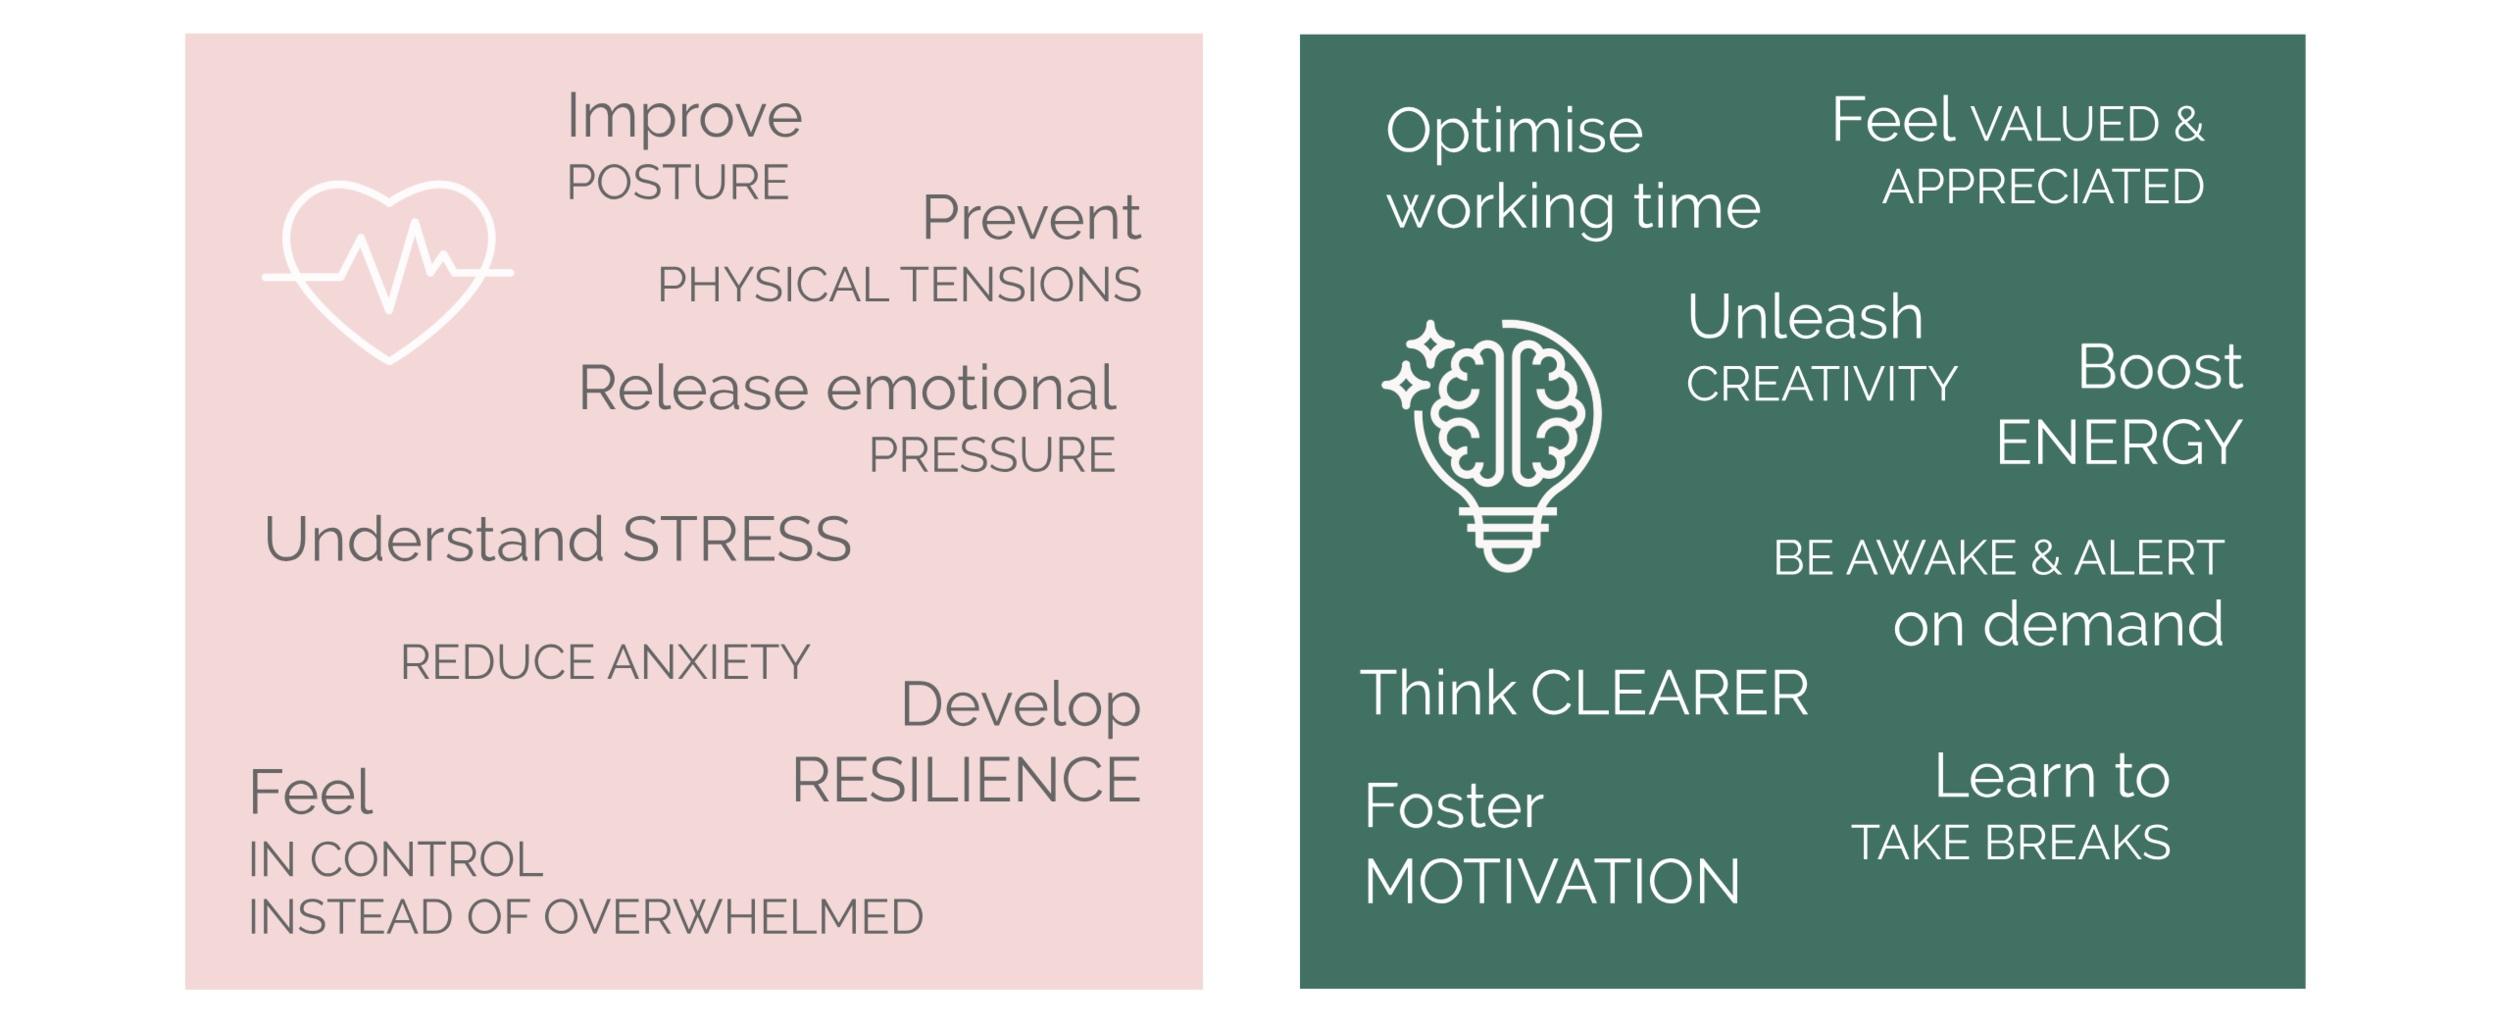 real-life-yoga-employee-success-team-health-productivity.jpg